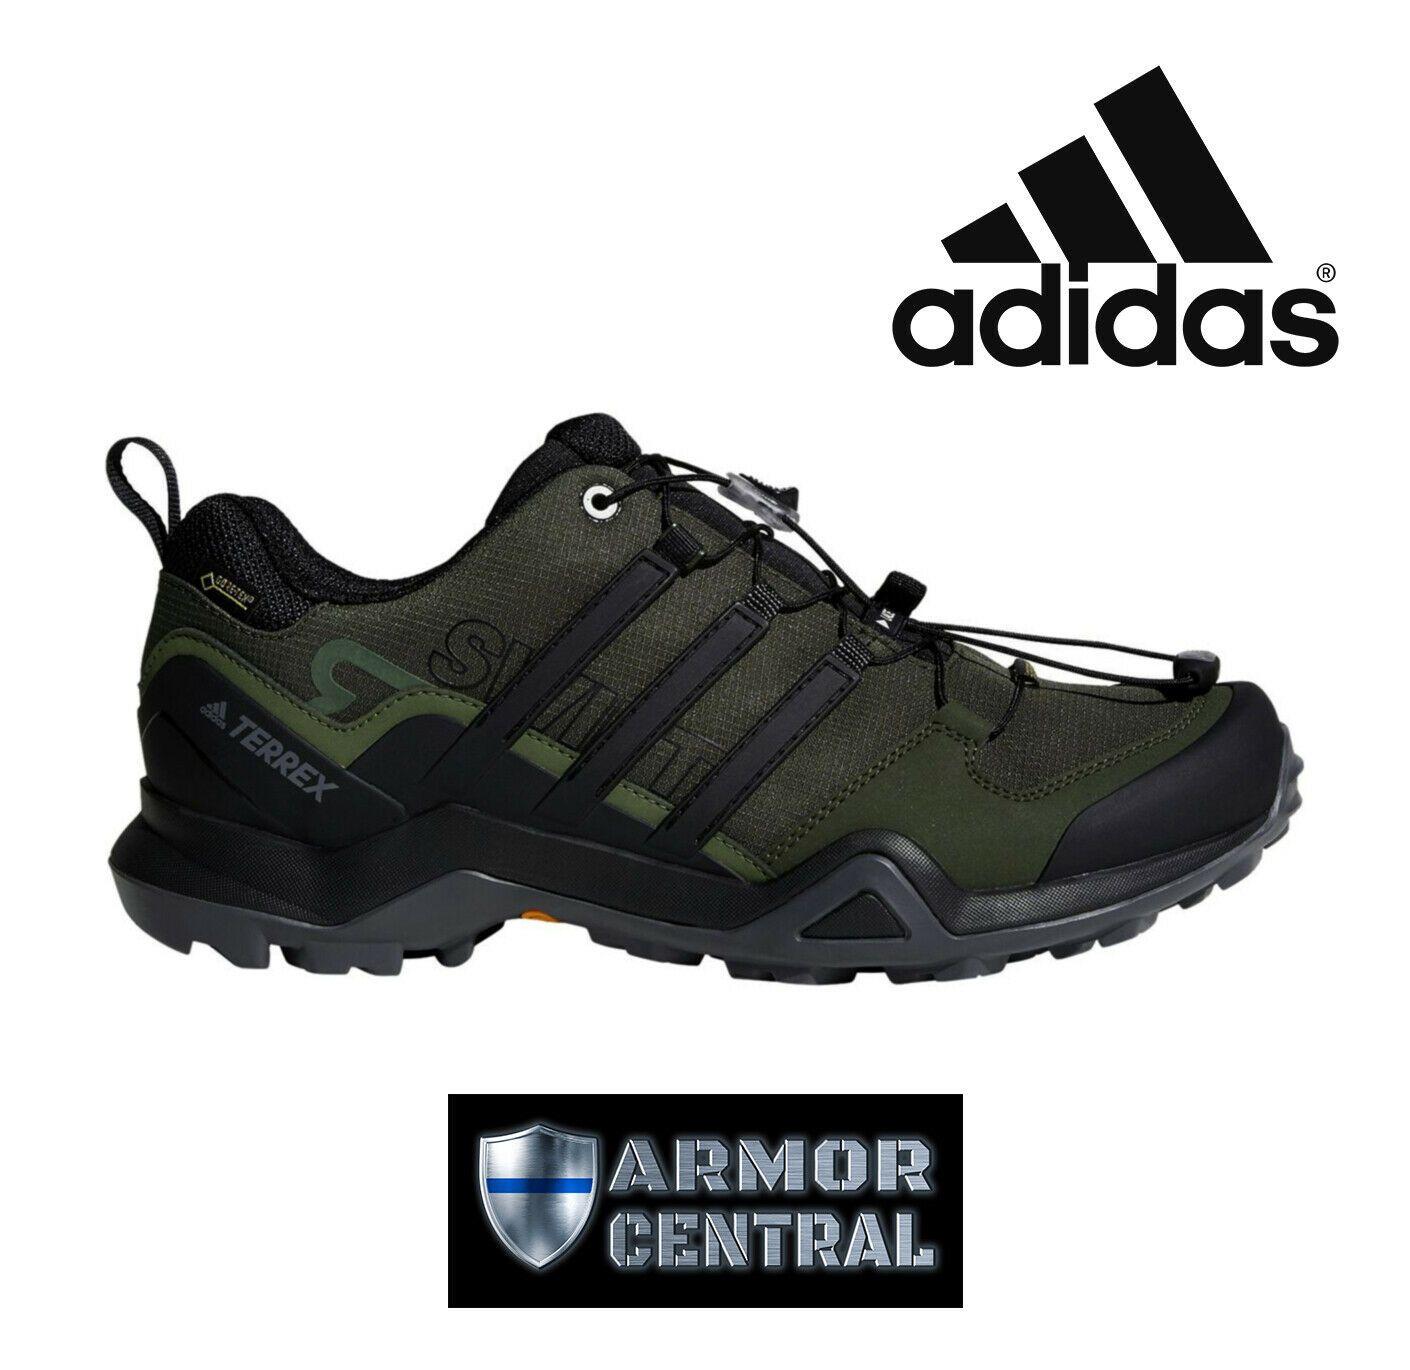 New Men S Green Adidas Terrex Swift R2 Gtx Shoes Waterproof Cm7497 Bestoffer4y Adidas Mens Green Shoes